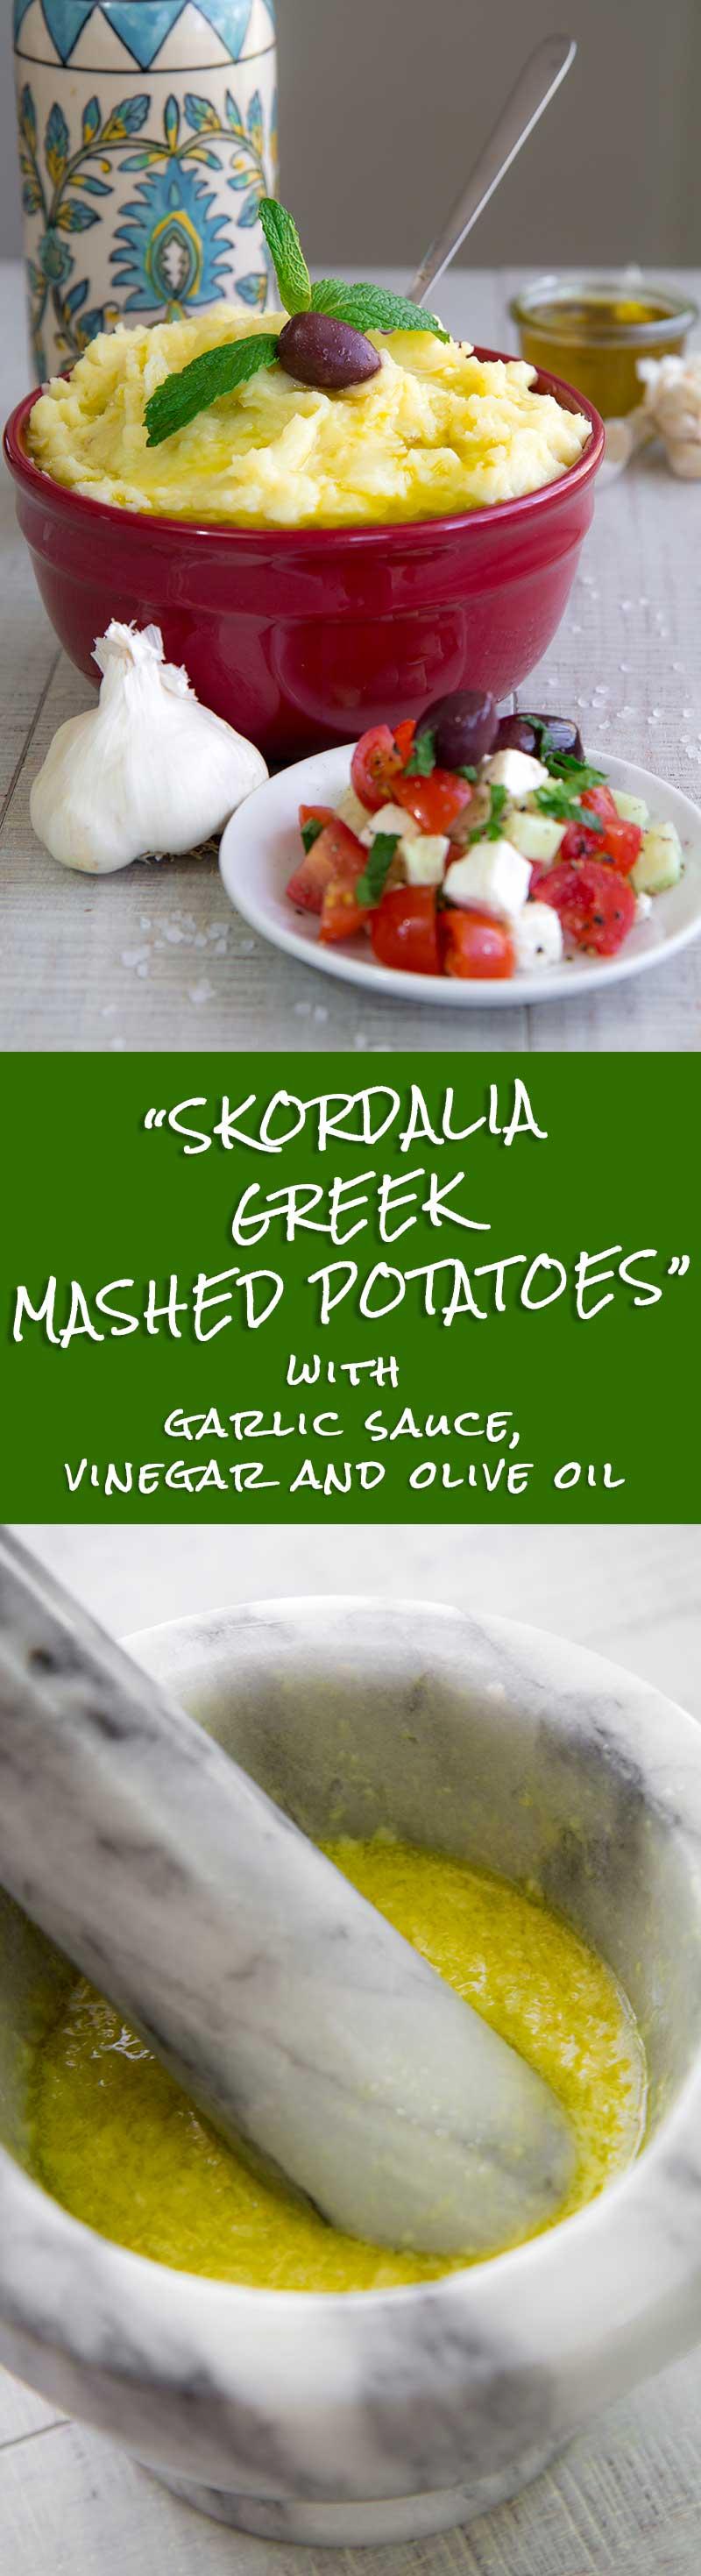 SKORDALIA RECIPE - Greek garlic mashed potatoes